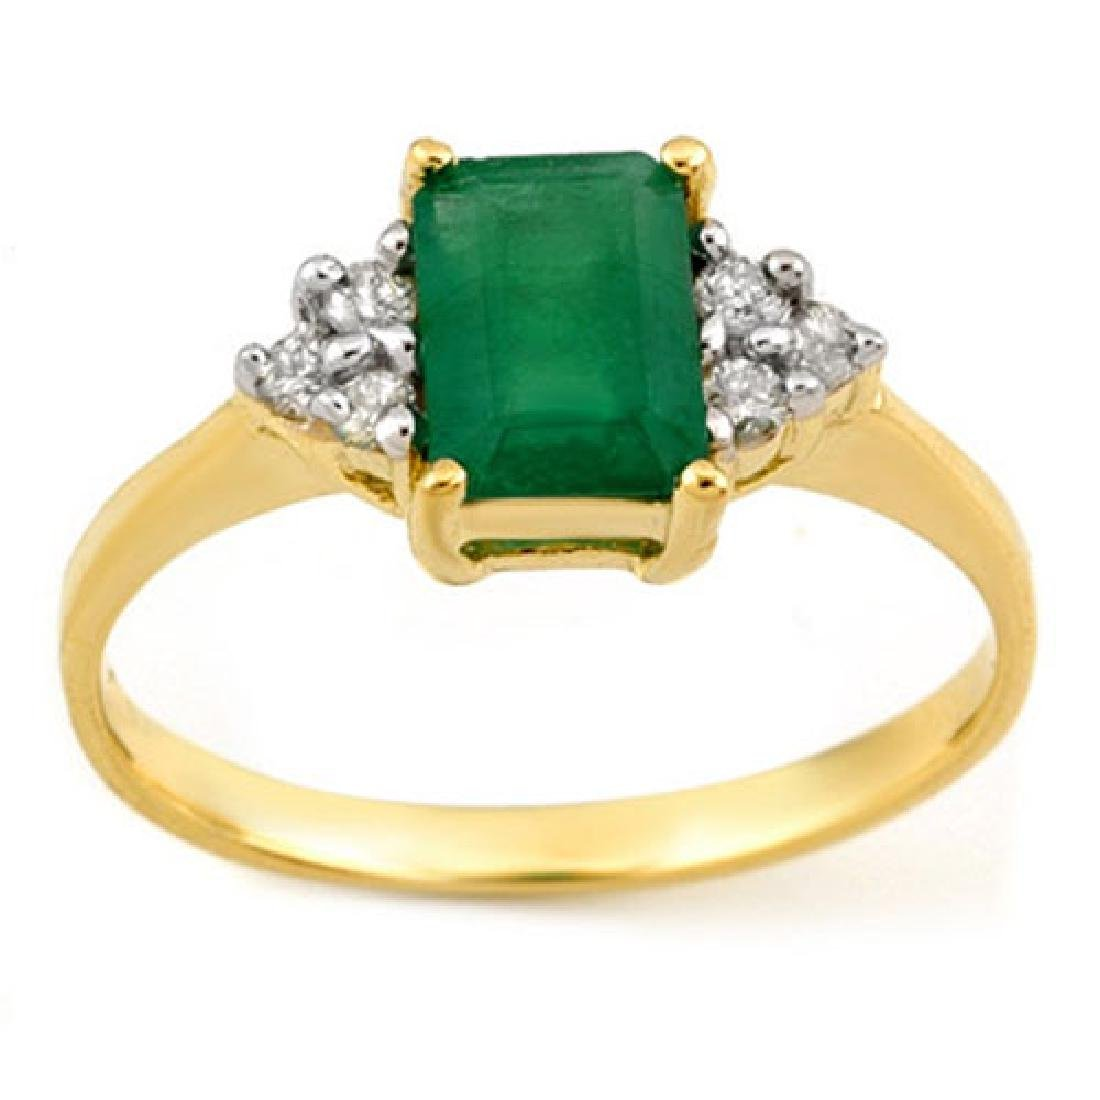 1.12 CTW Emerald & Diamond Ring 18K Yellow Gold